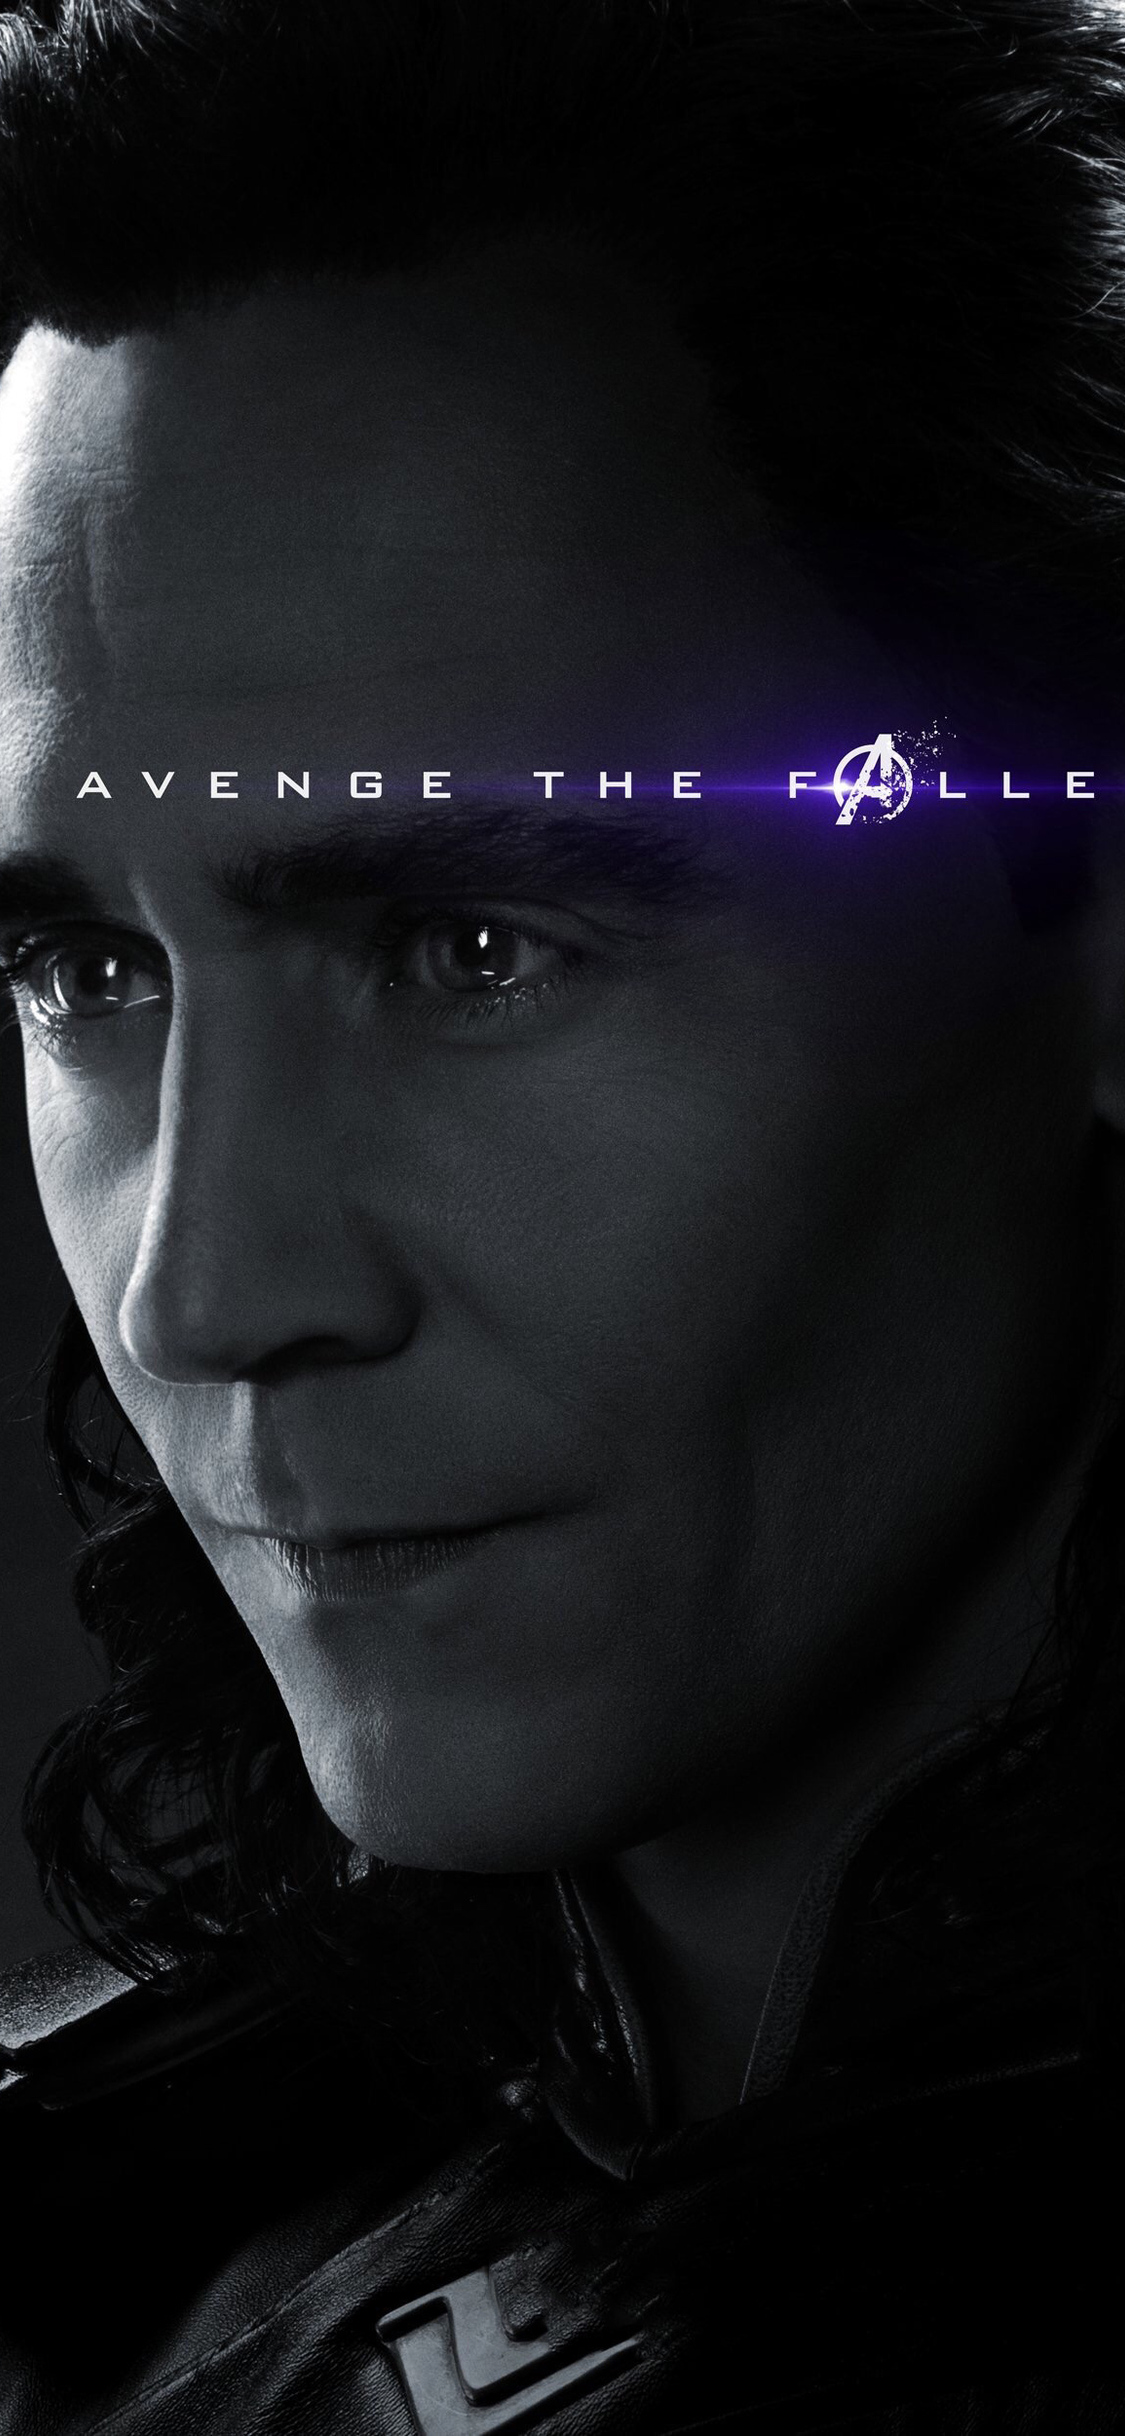 1125x2436 Loki Avengers Endgame 2019 Poster Iphone Xsiphone